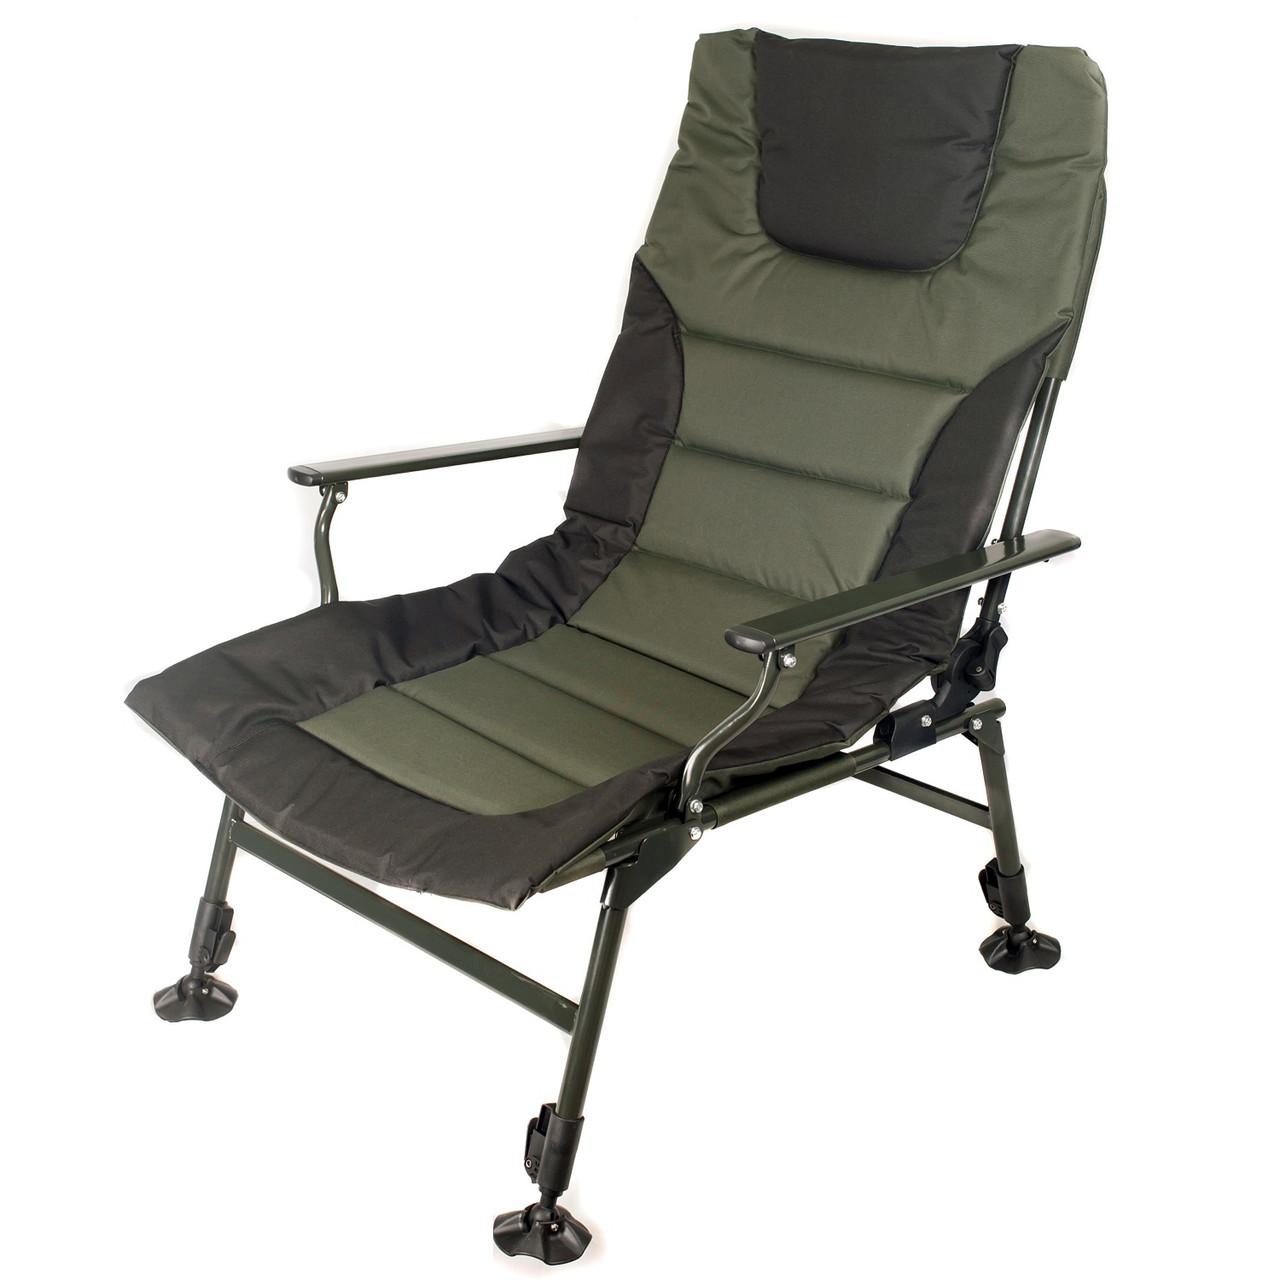 Карповое кресло Ranger Wide Carp SL-105 RA 2226